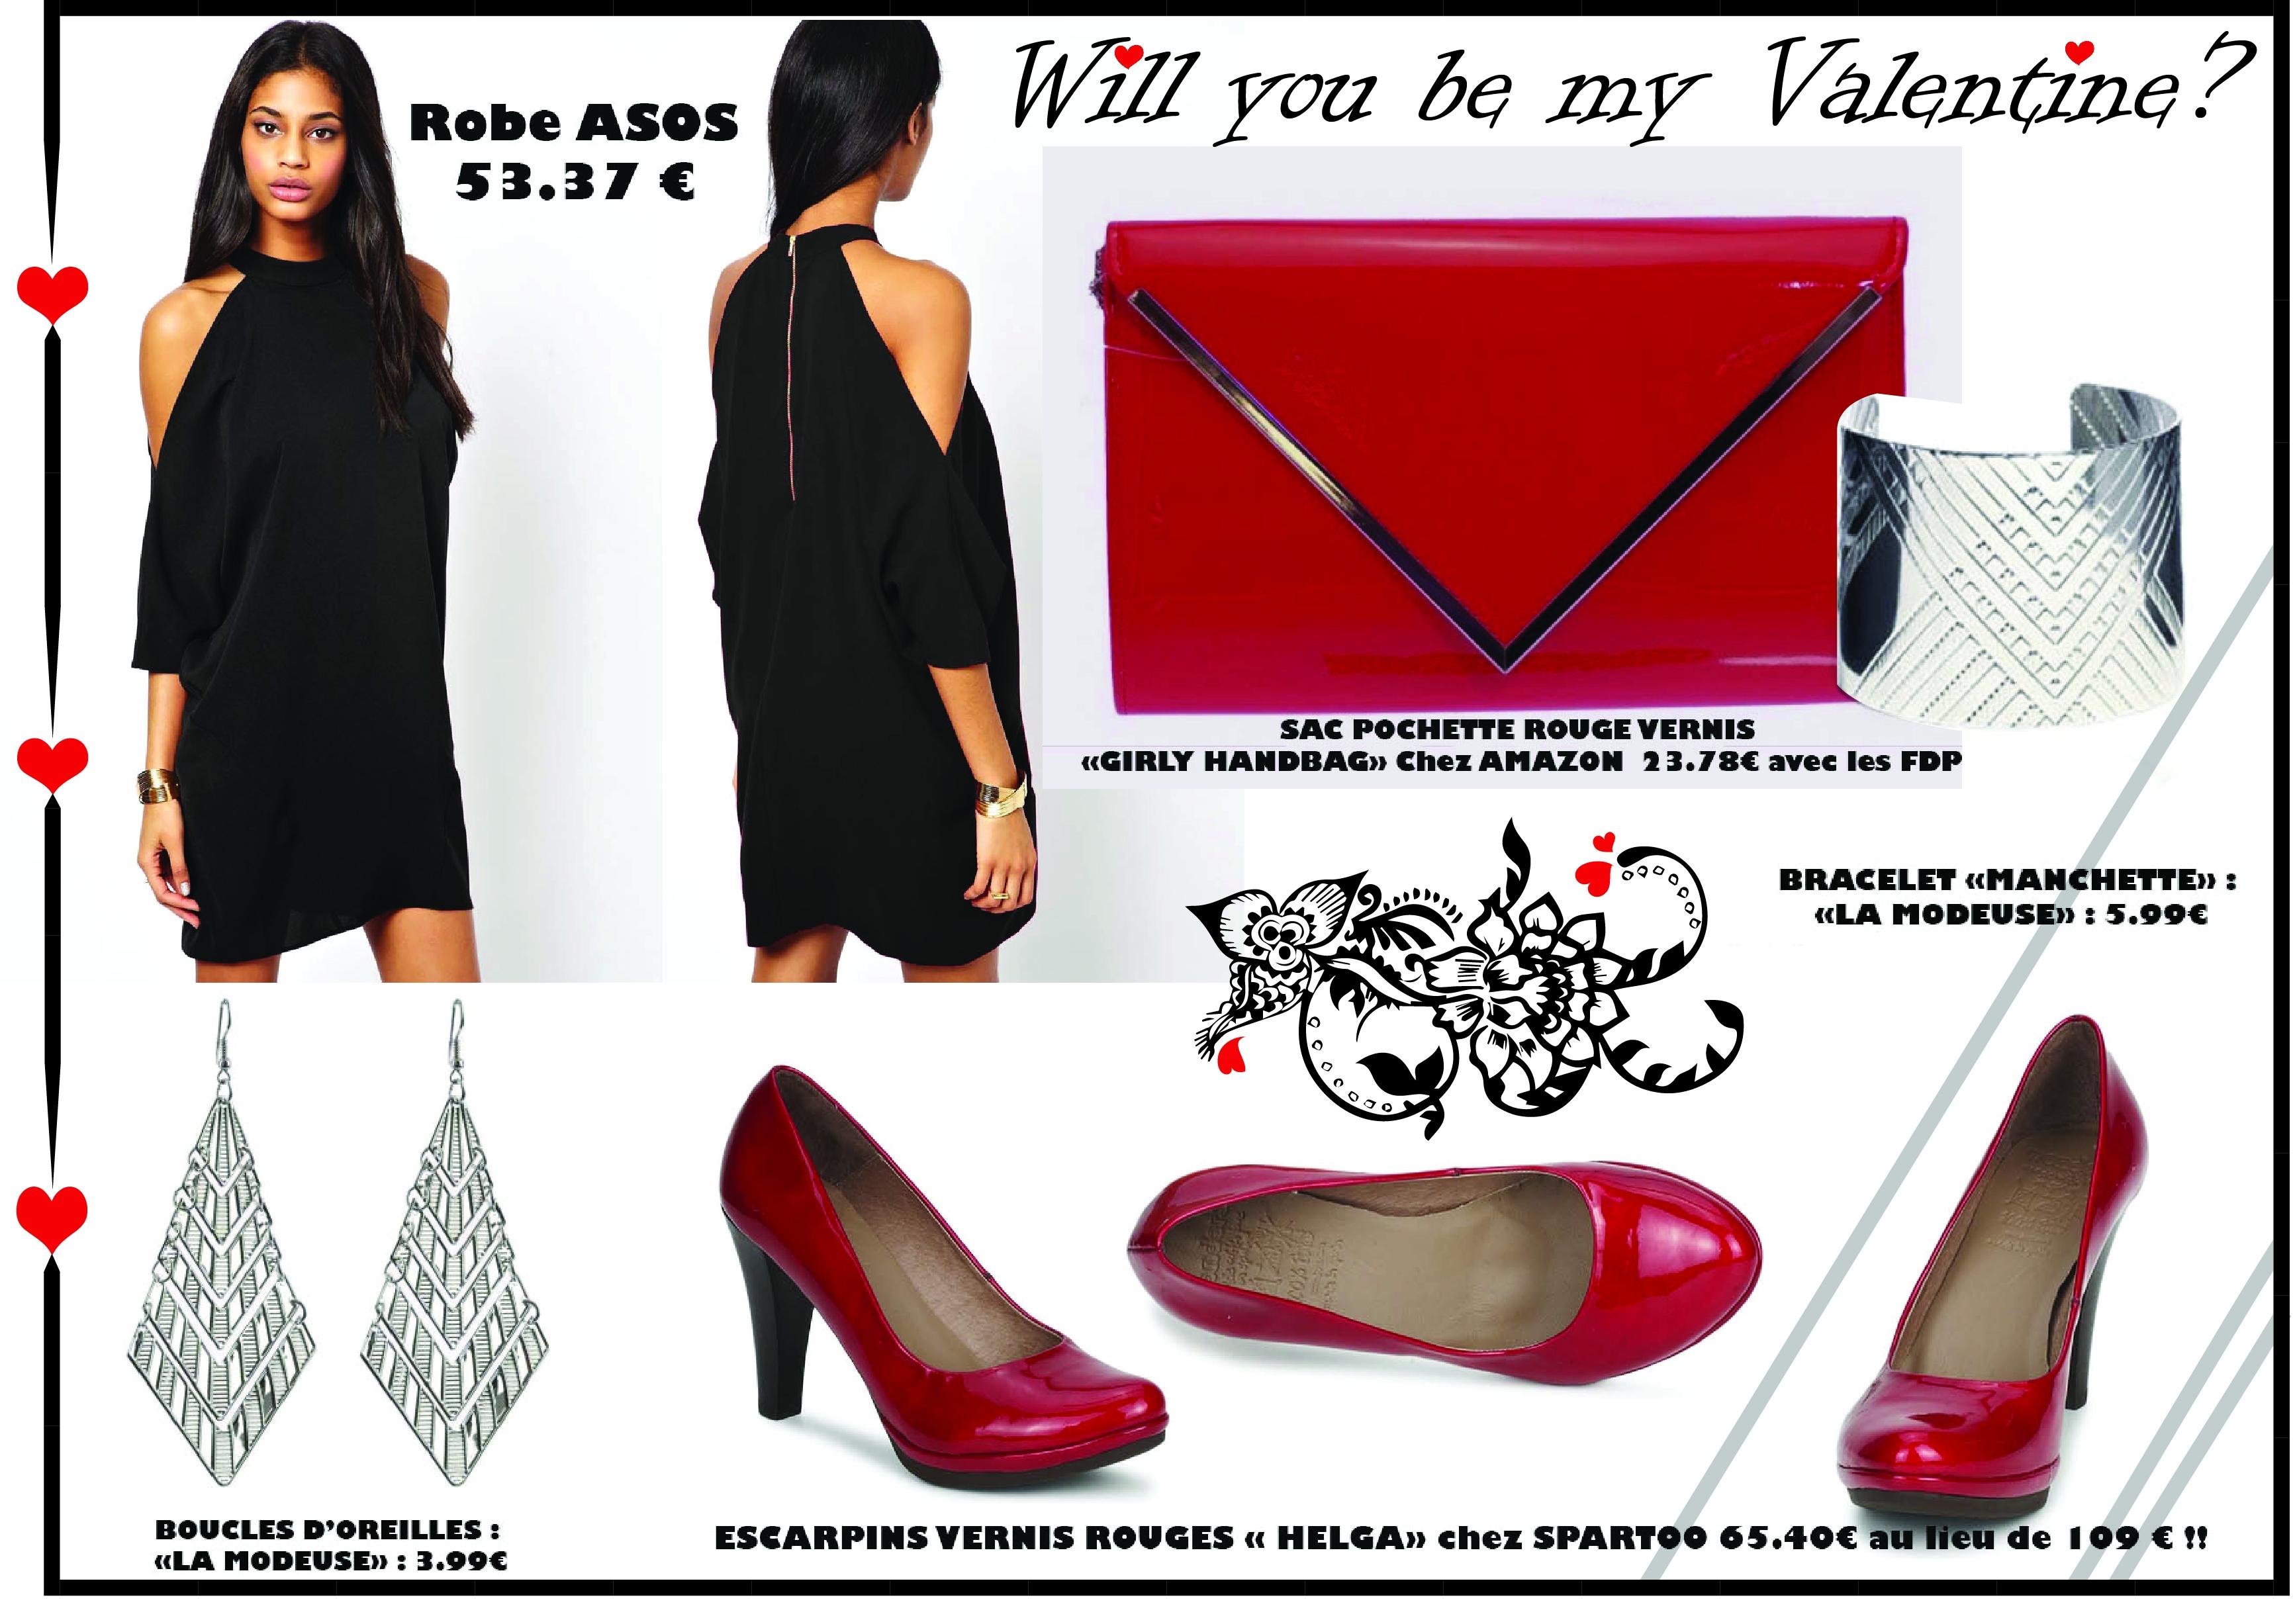 f05e8cbabf676a2100520bda666c1d0d - Total Look « WILL YOU BE MY VALENTINE ? »